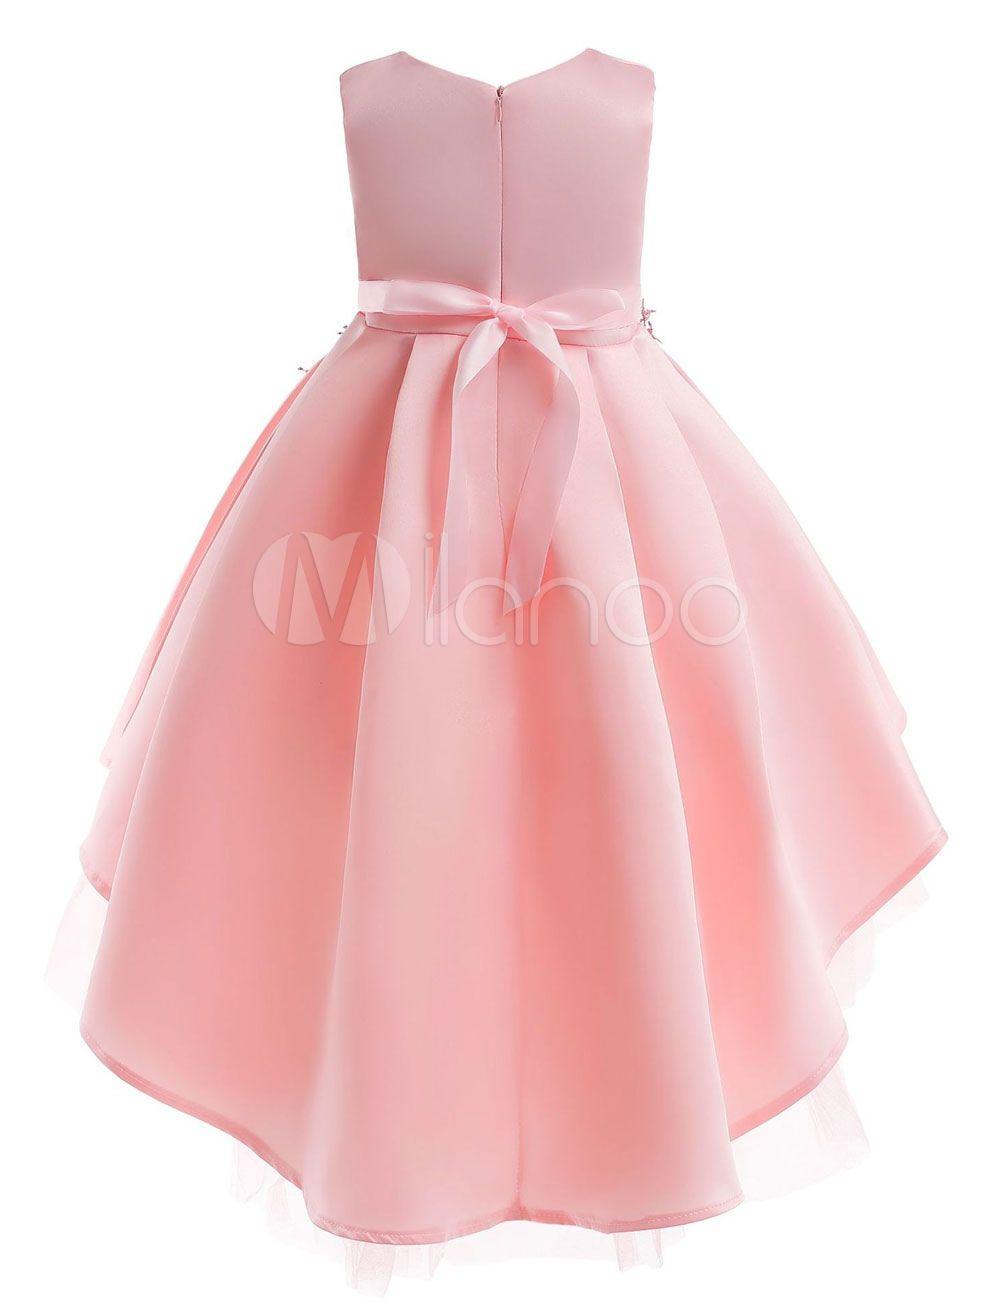 Flower Girl Dresses Pink A Line High Low Applique Asymmetrical